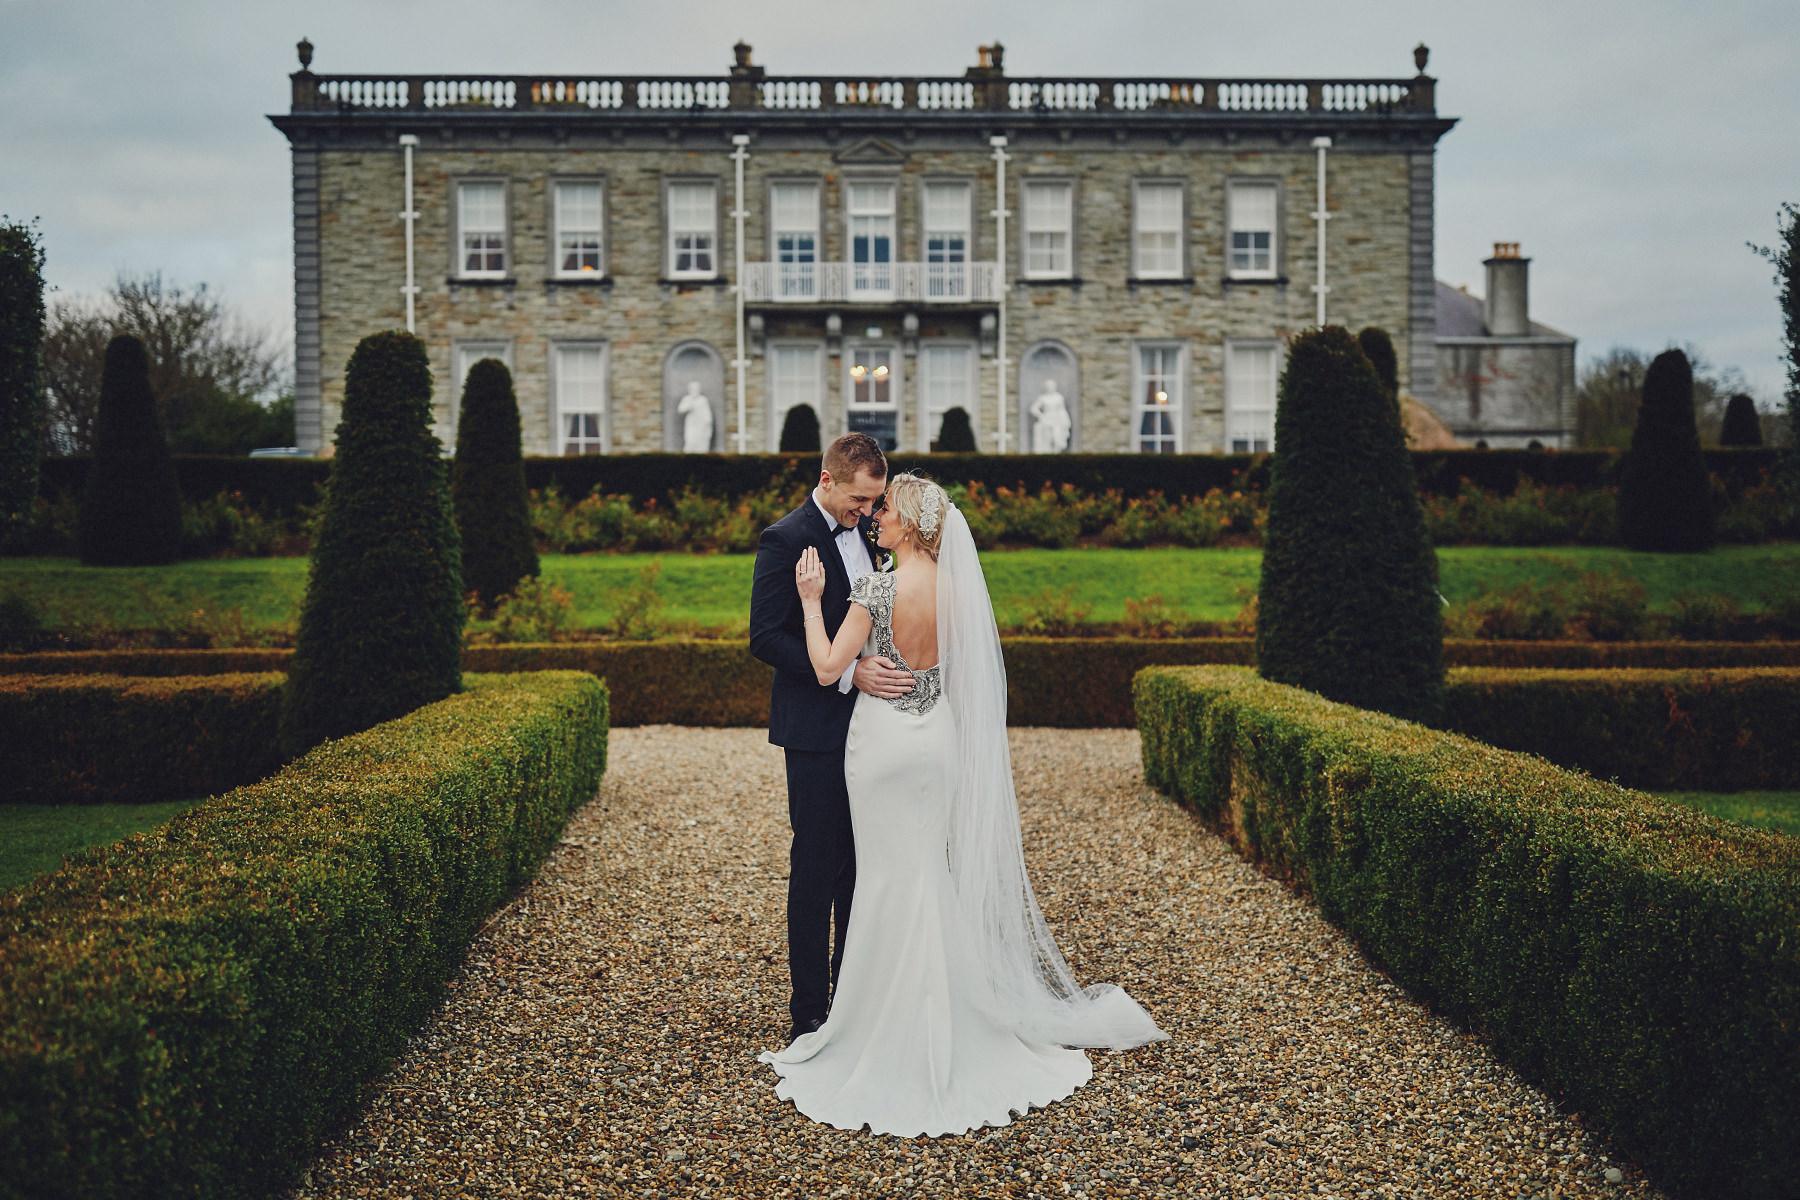 Wedding at The Palmerstown Estate